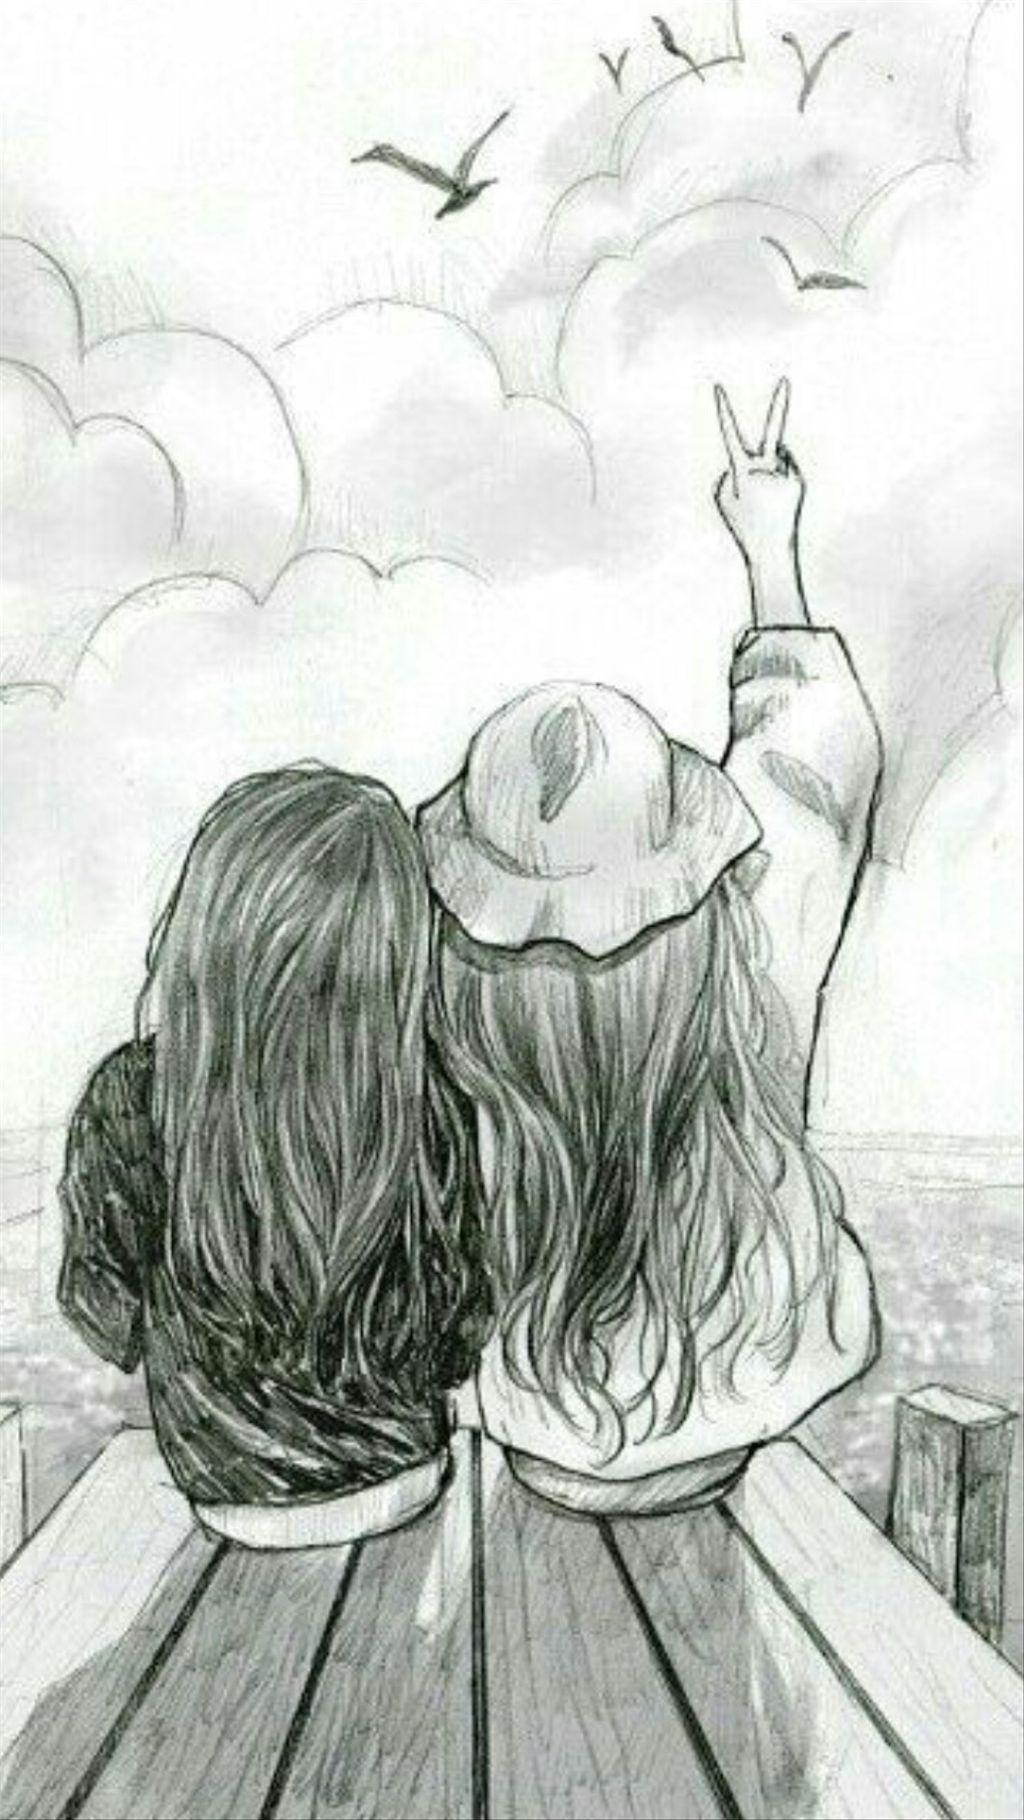 Картинки простым карандашом про дружбу